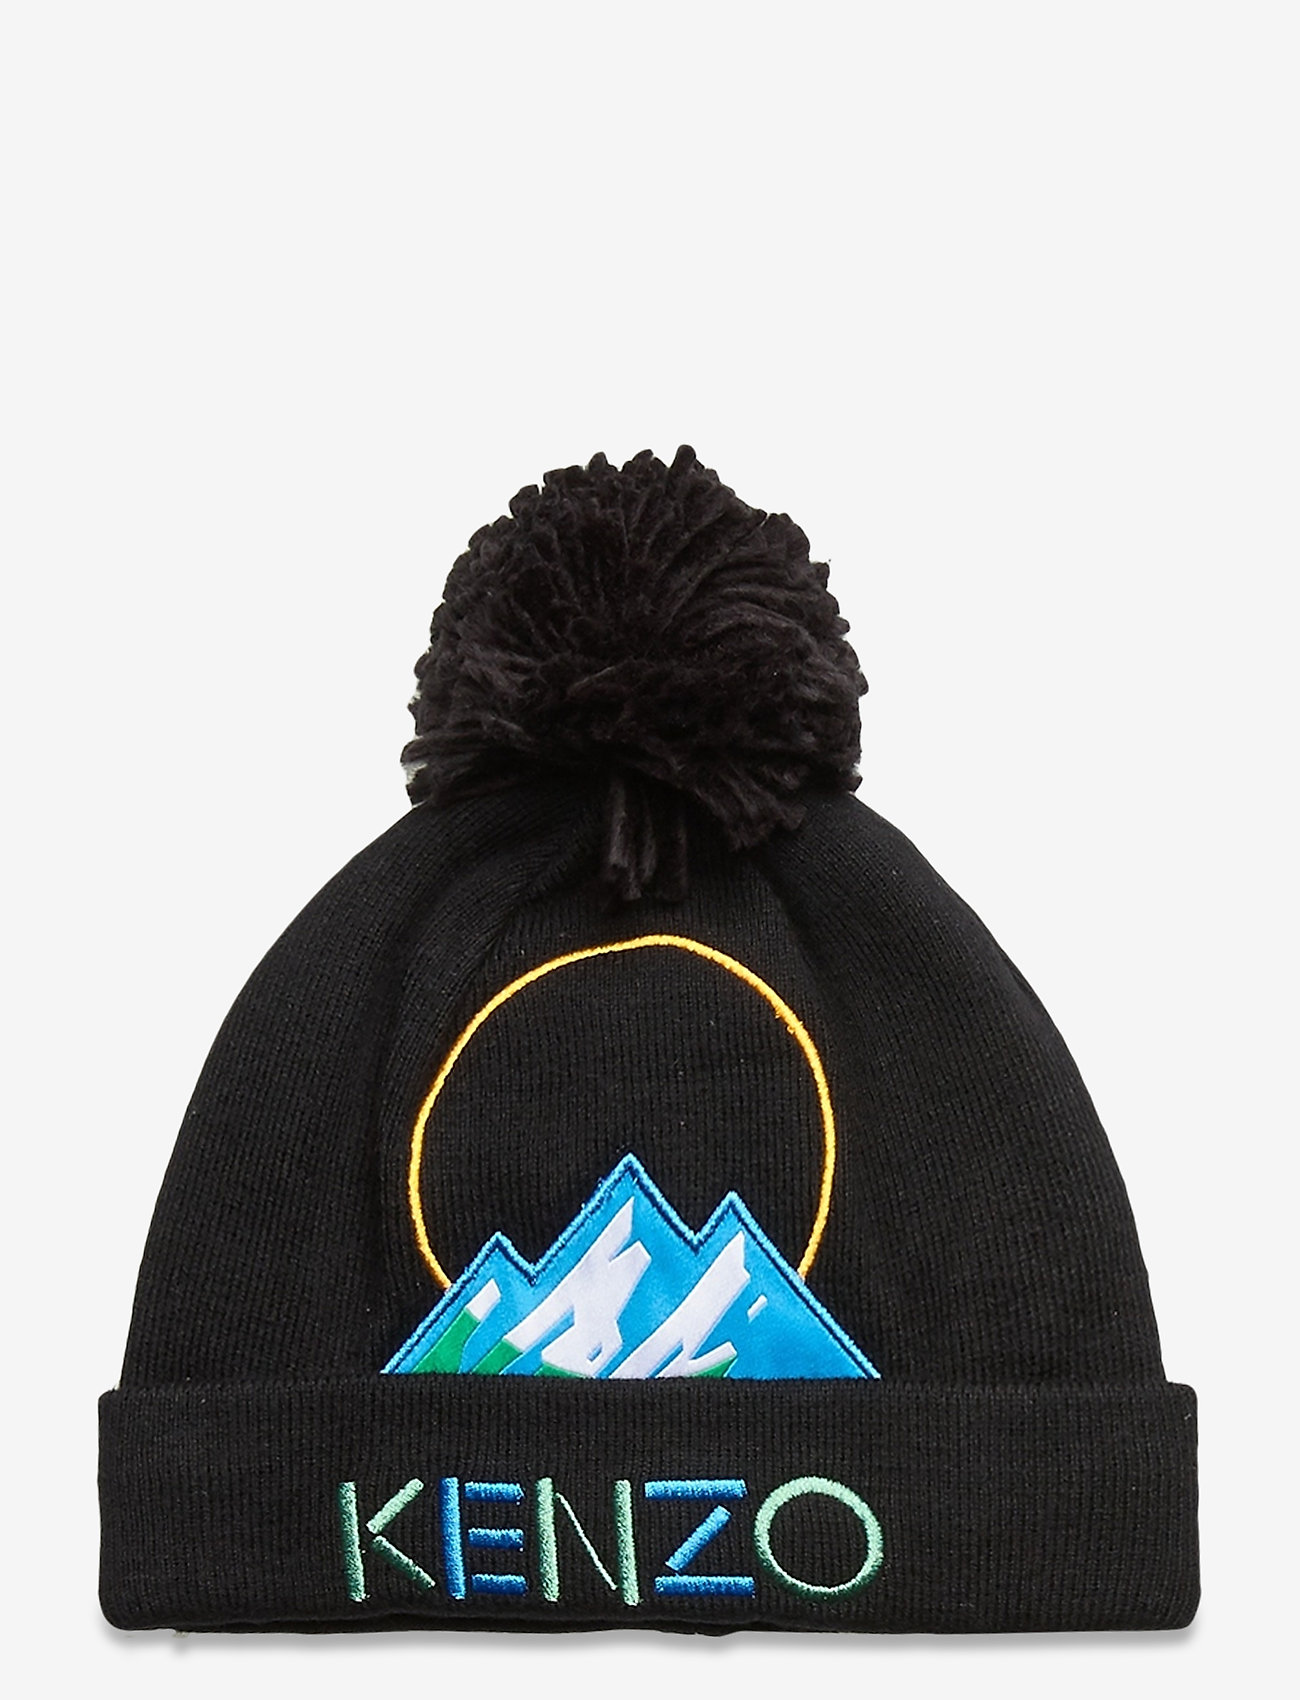 Kenzo - PULL ON HAT - huer - black - 0